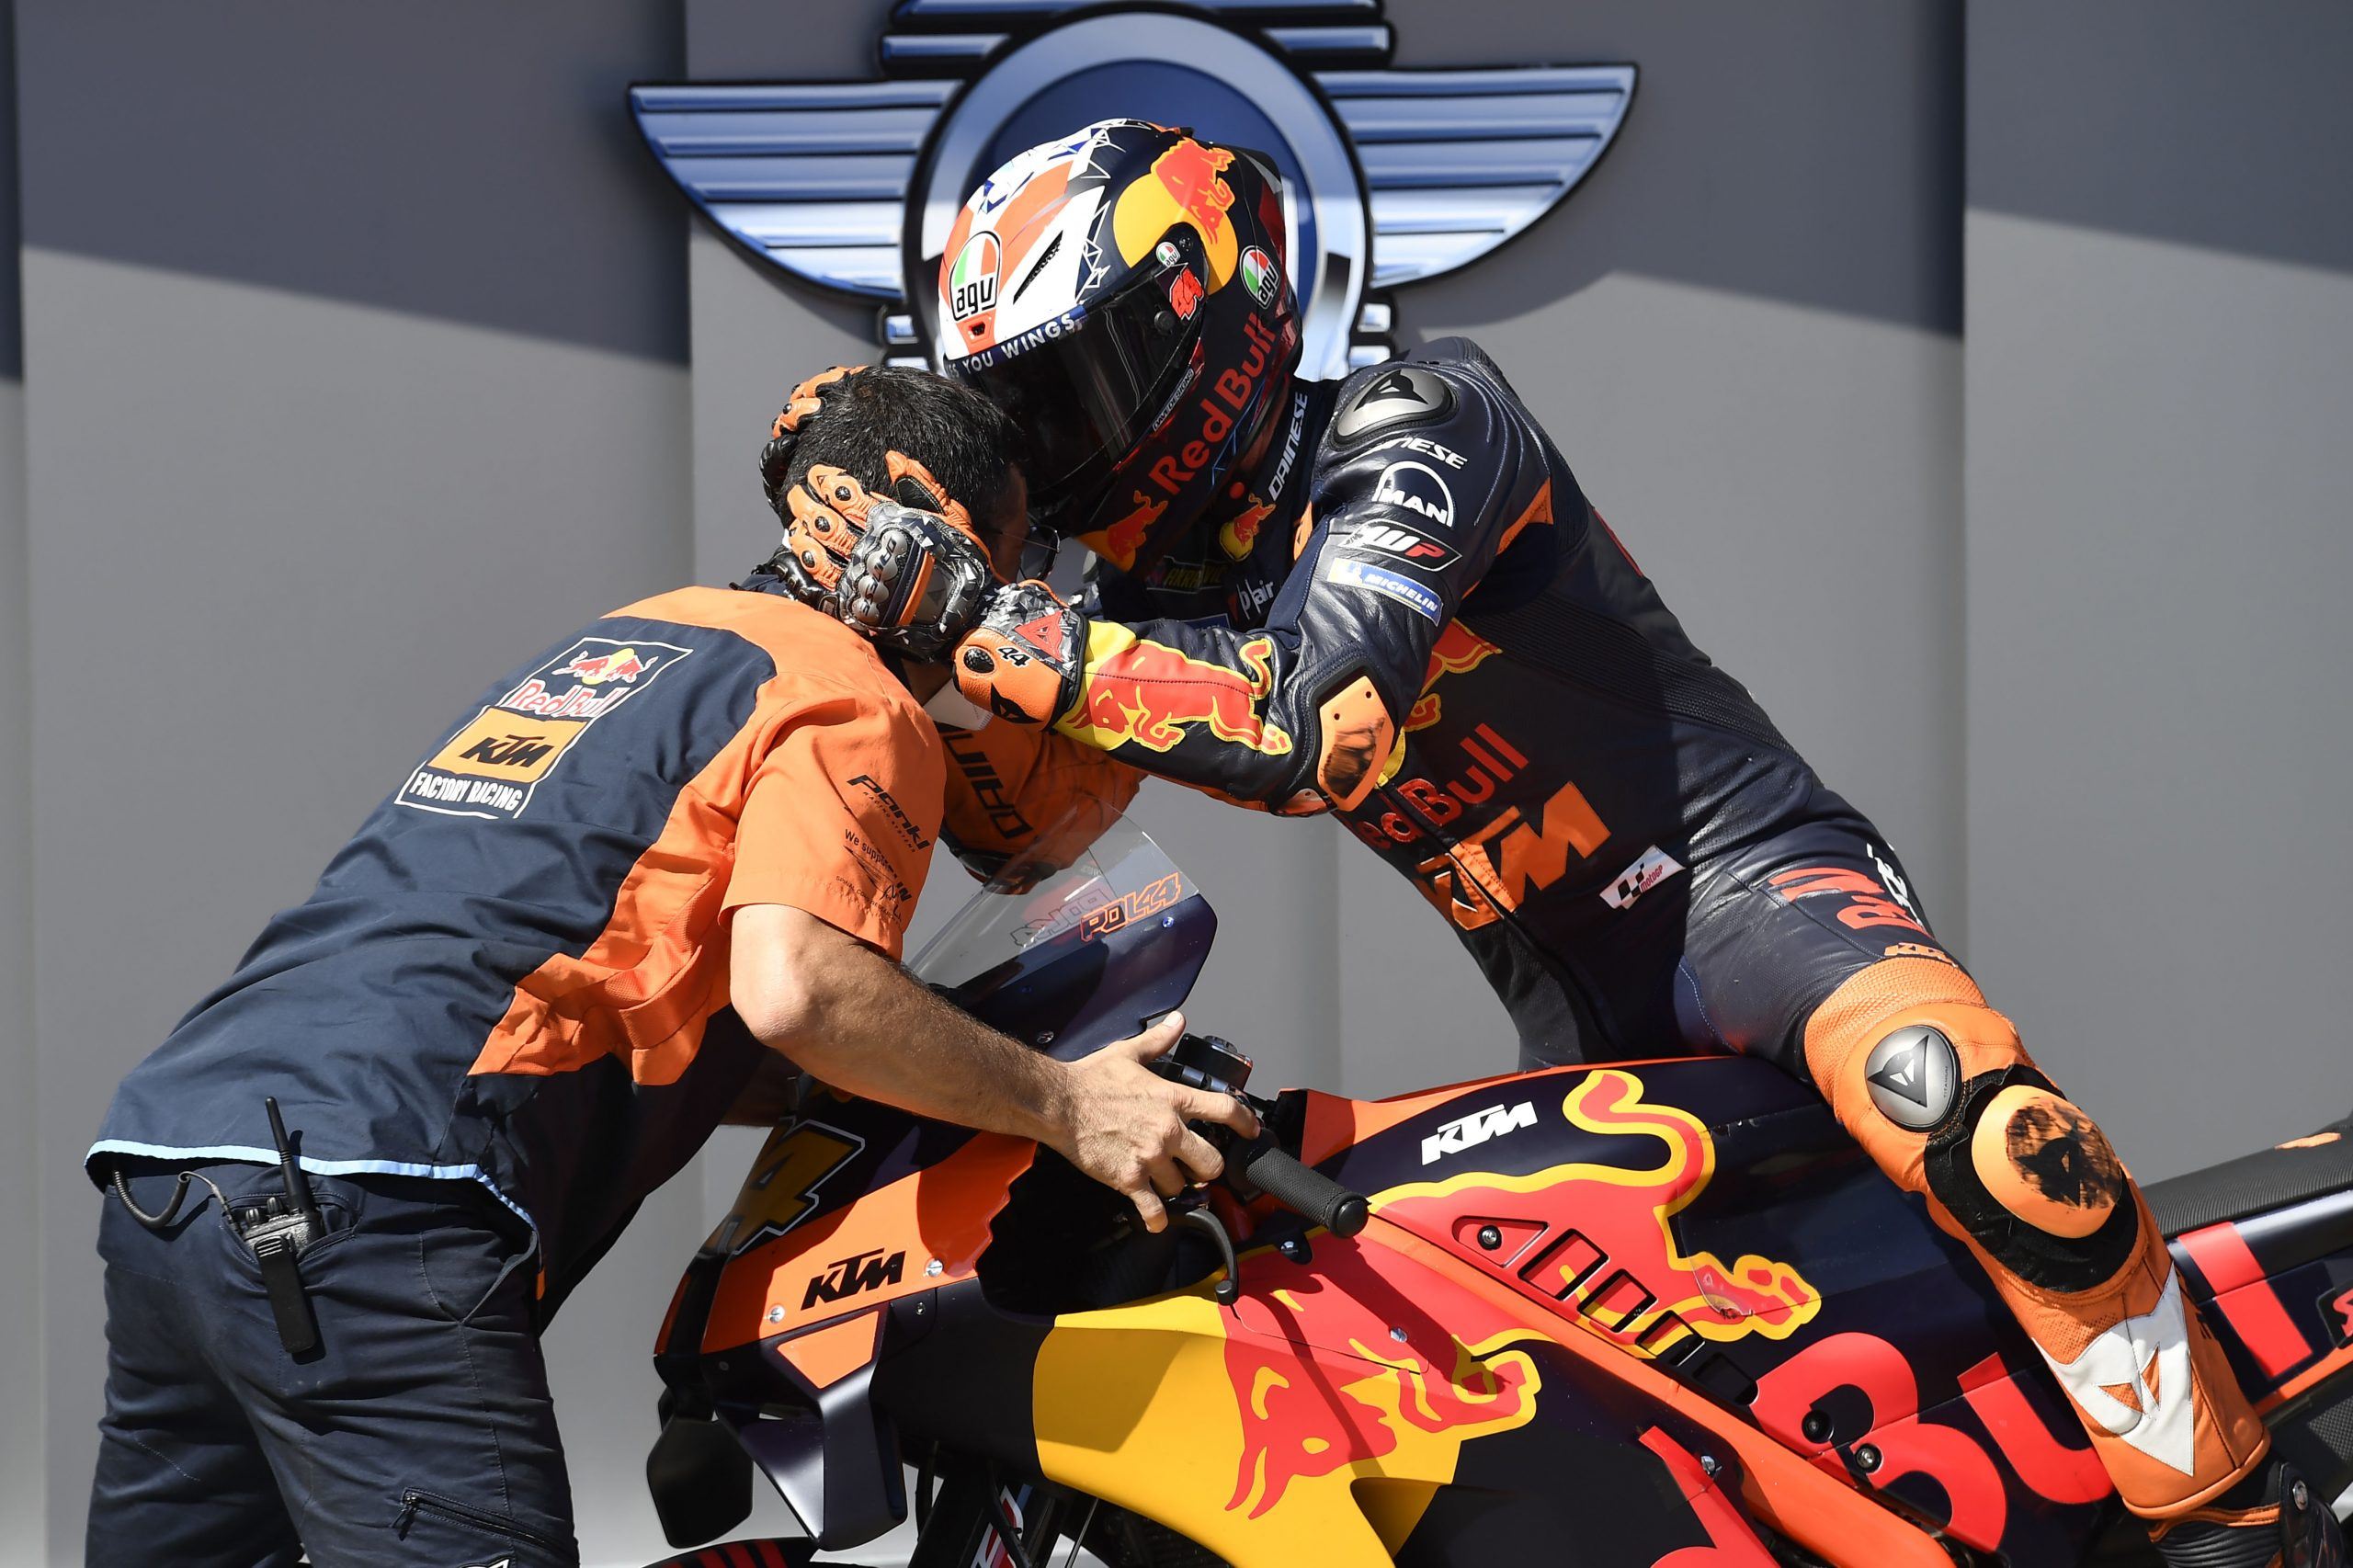 MotoGP: Pol Espargaro